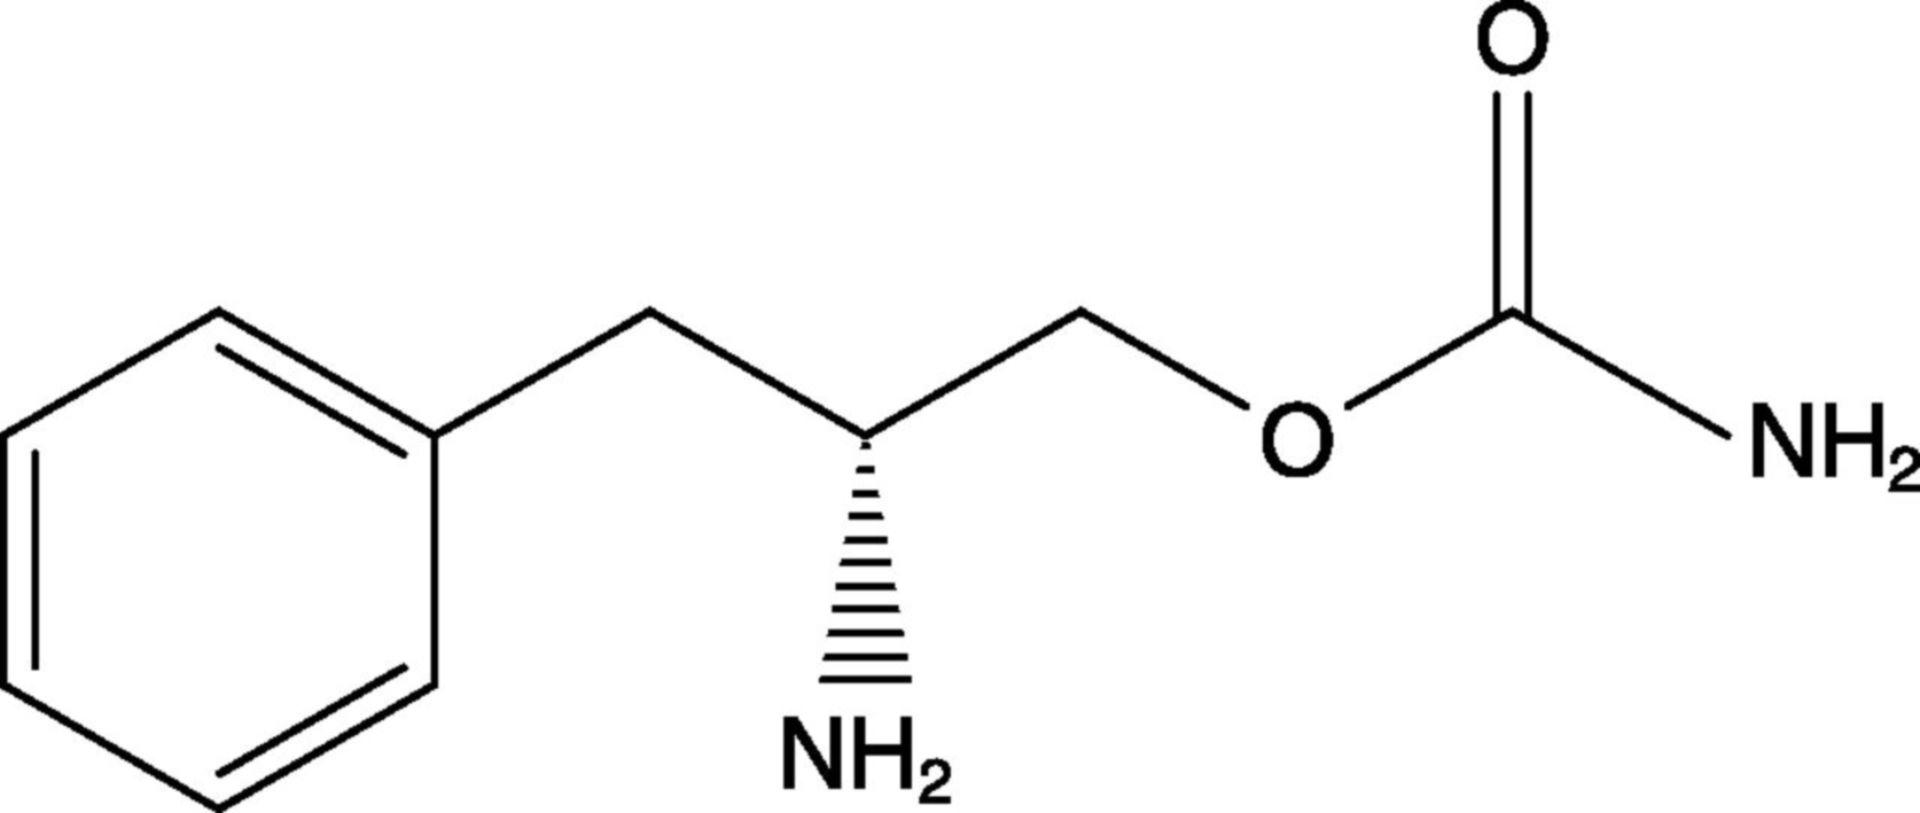 Solriamfetol Struktur